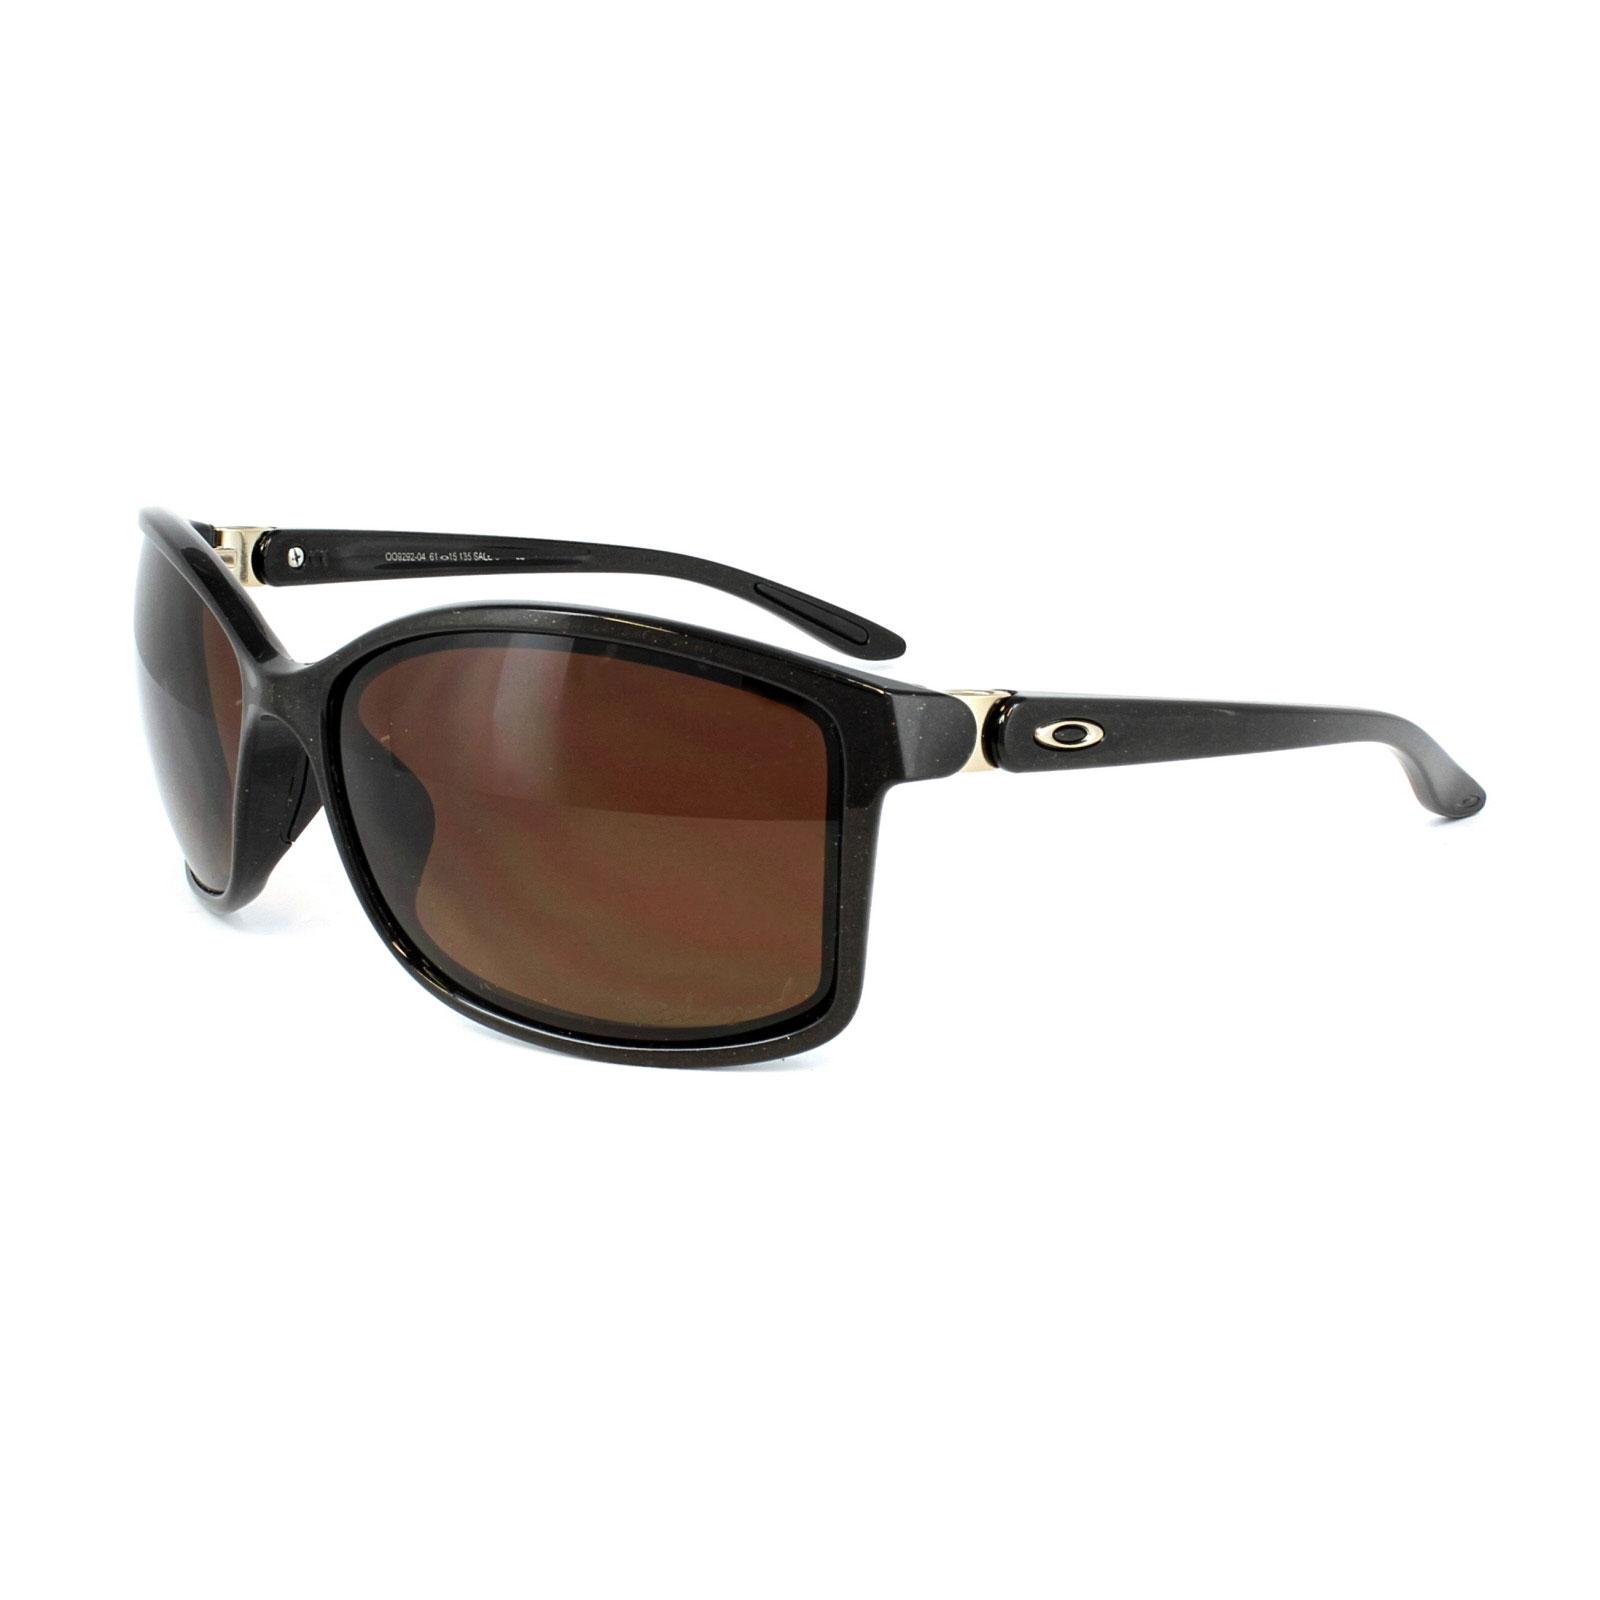 016a1c728b0 Cheap Oakley Step Up Sunglasses - Discounted Sunglasses